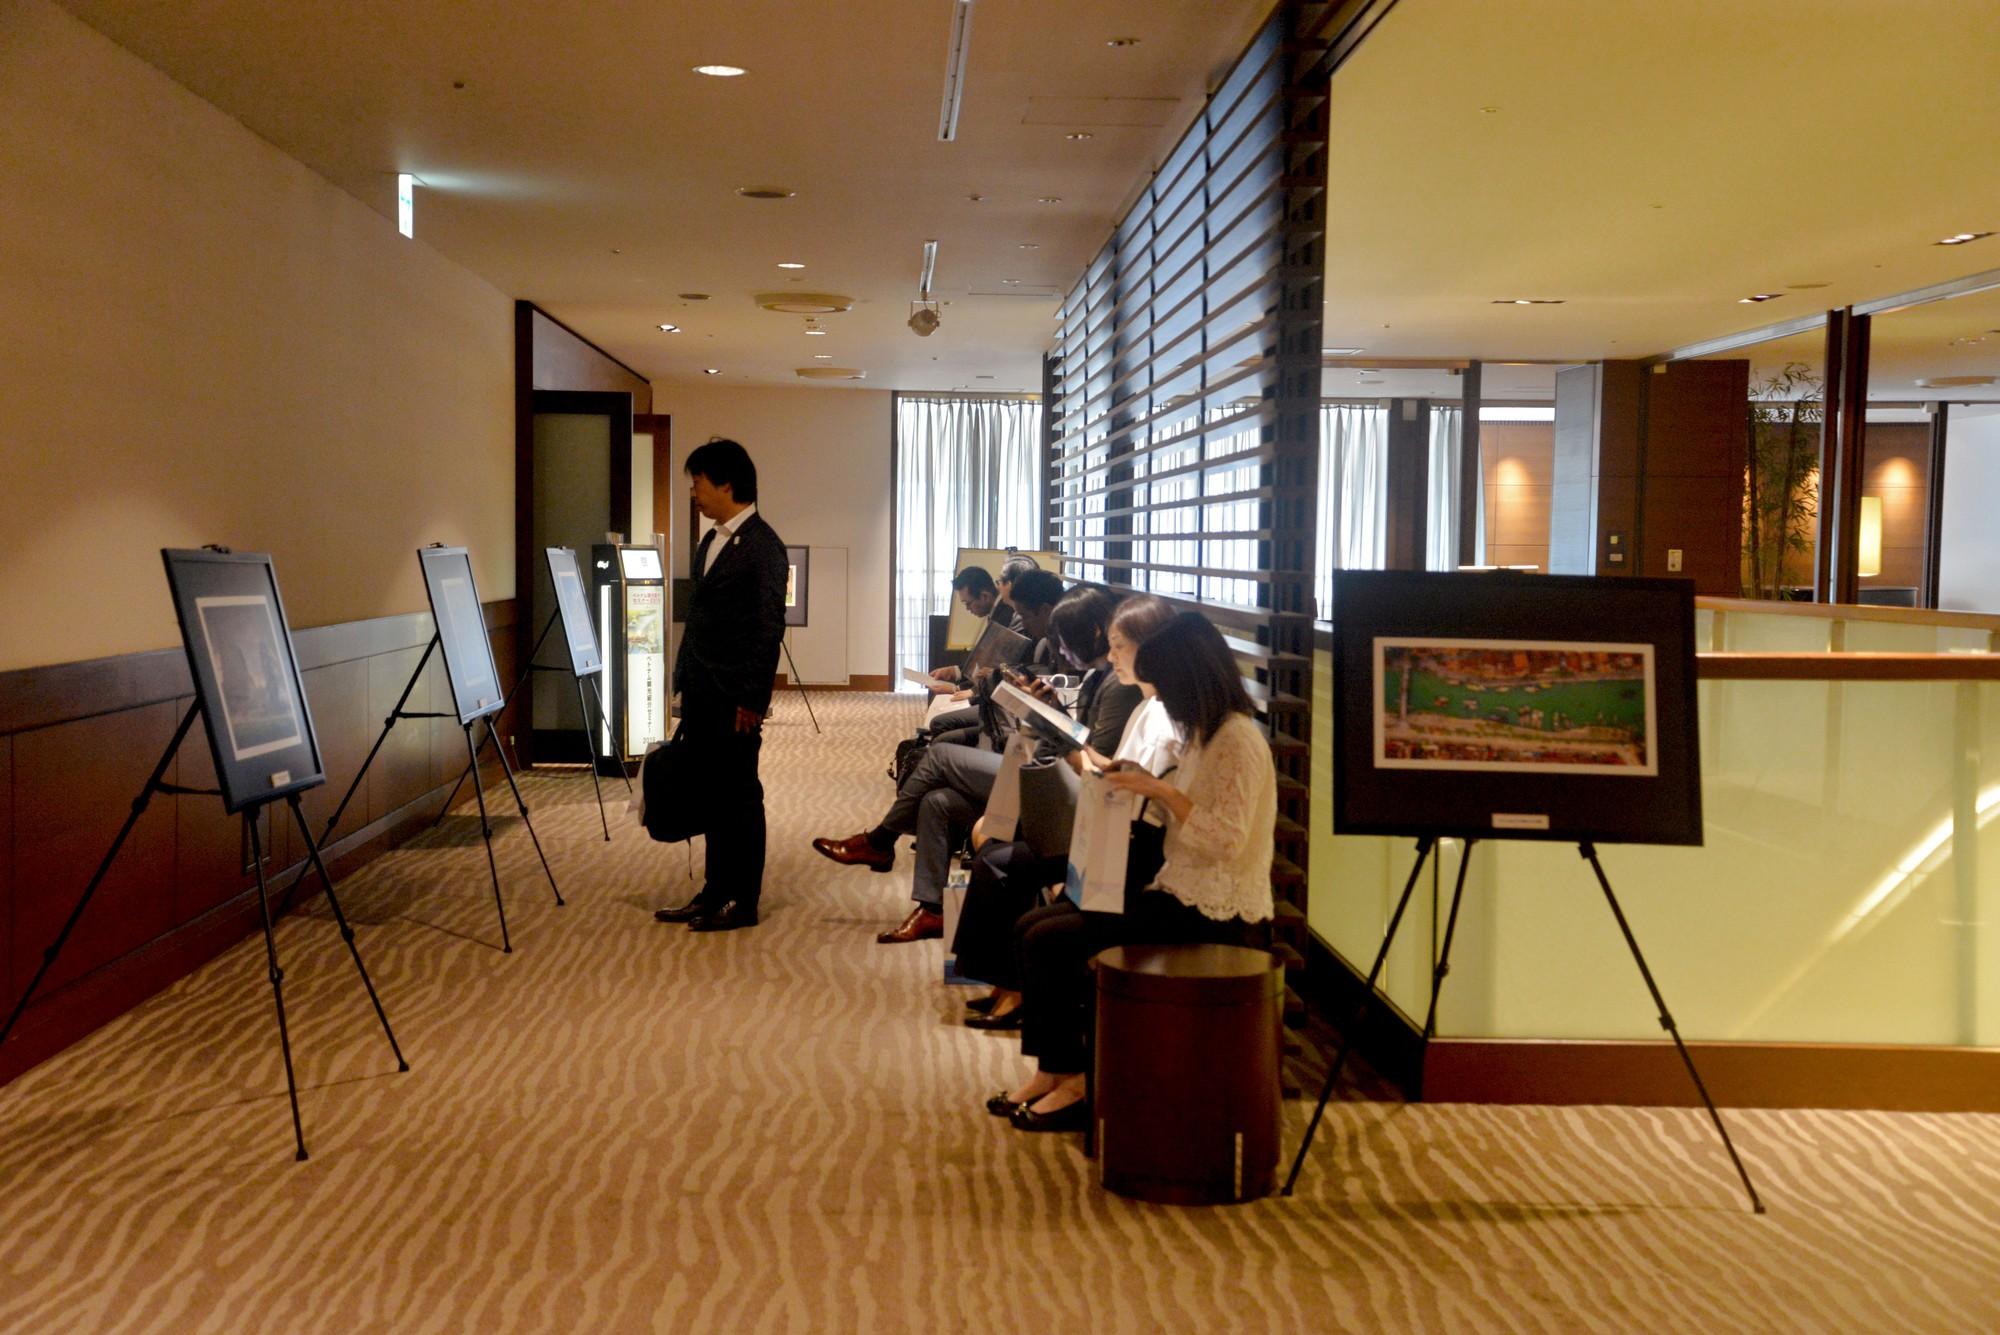 Giới thiệu Du lịch Việt Nam tại Sapporo, tỉnh Hokkaido - Ảnh 6.